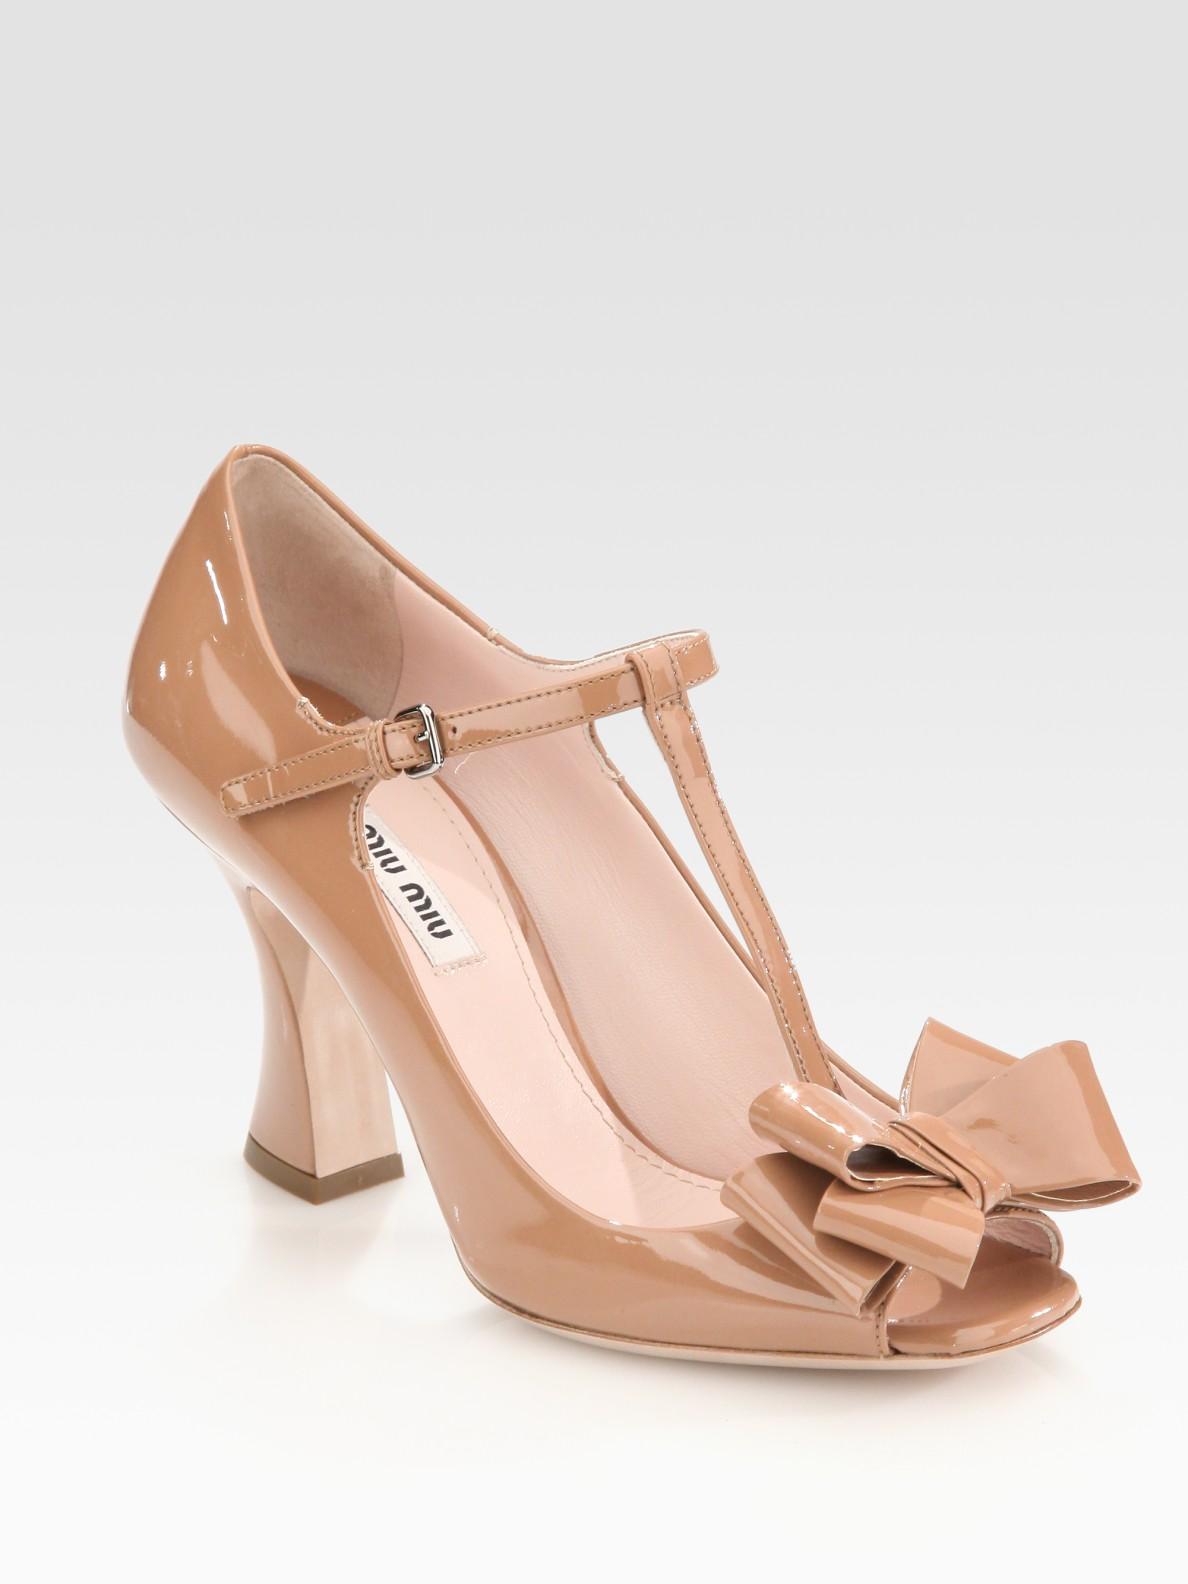 969f5284ac3f6 Miu Miu Patent Leather Tstrap Bow Sandals in Natural - Lyst